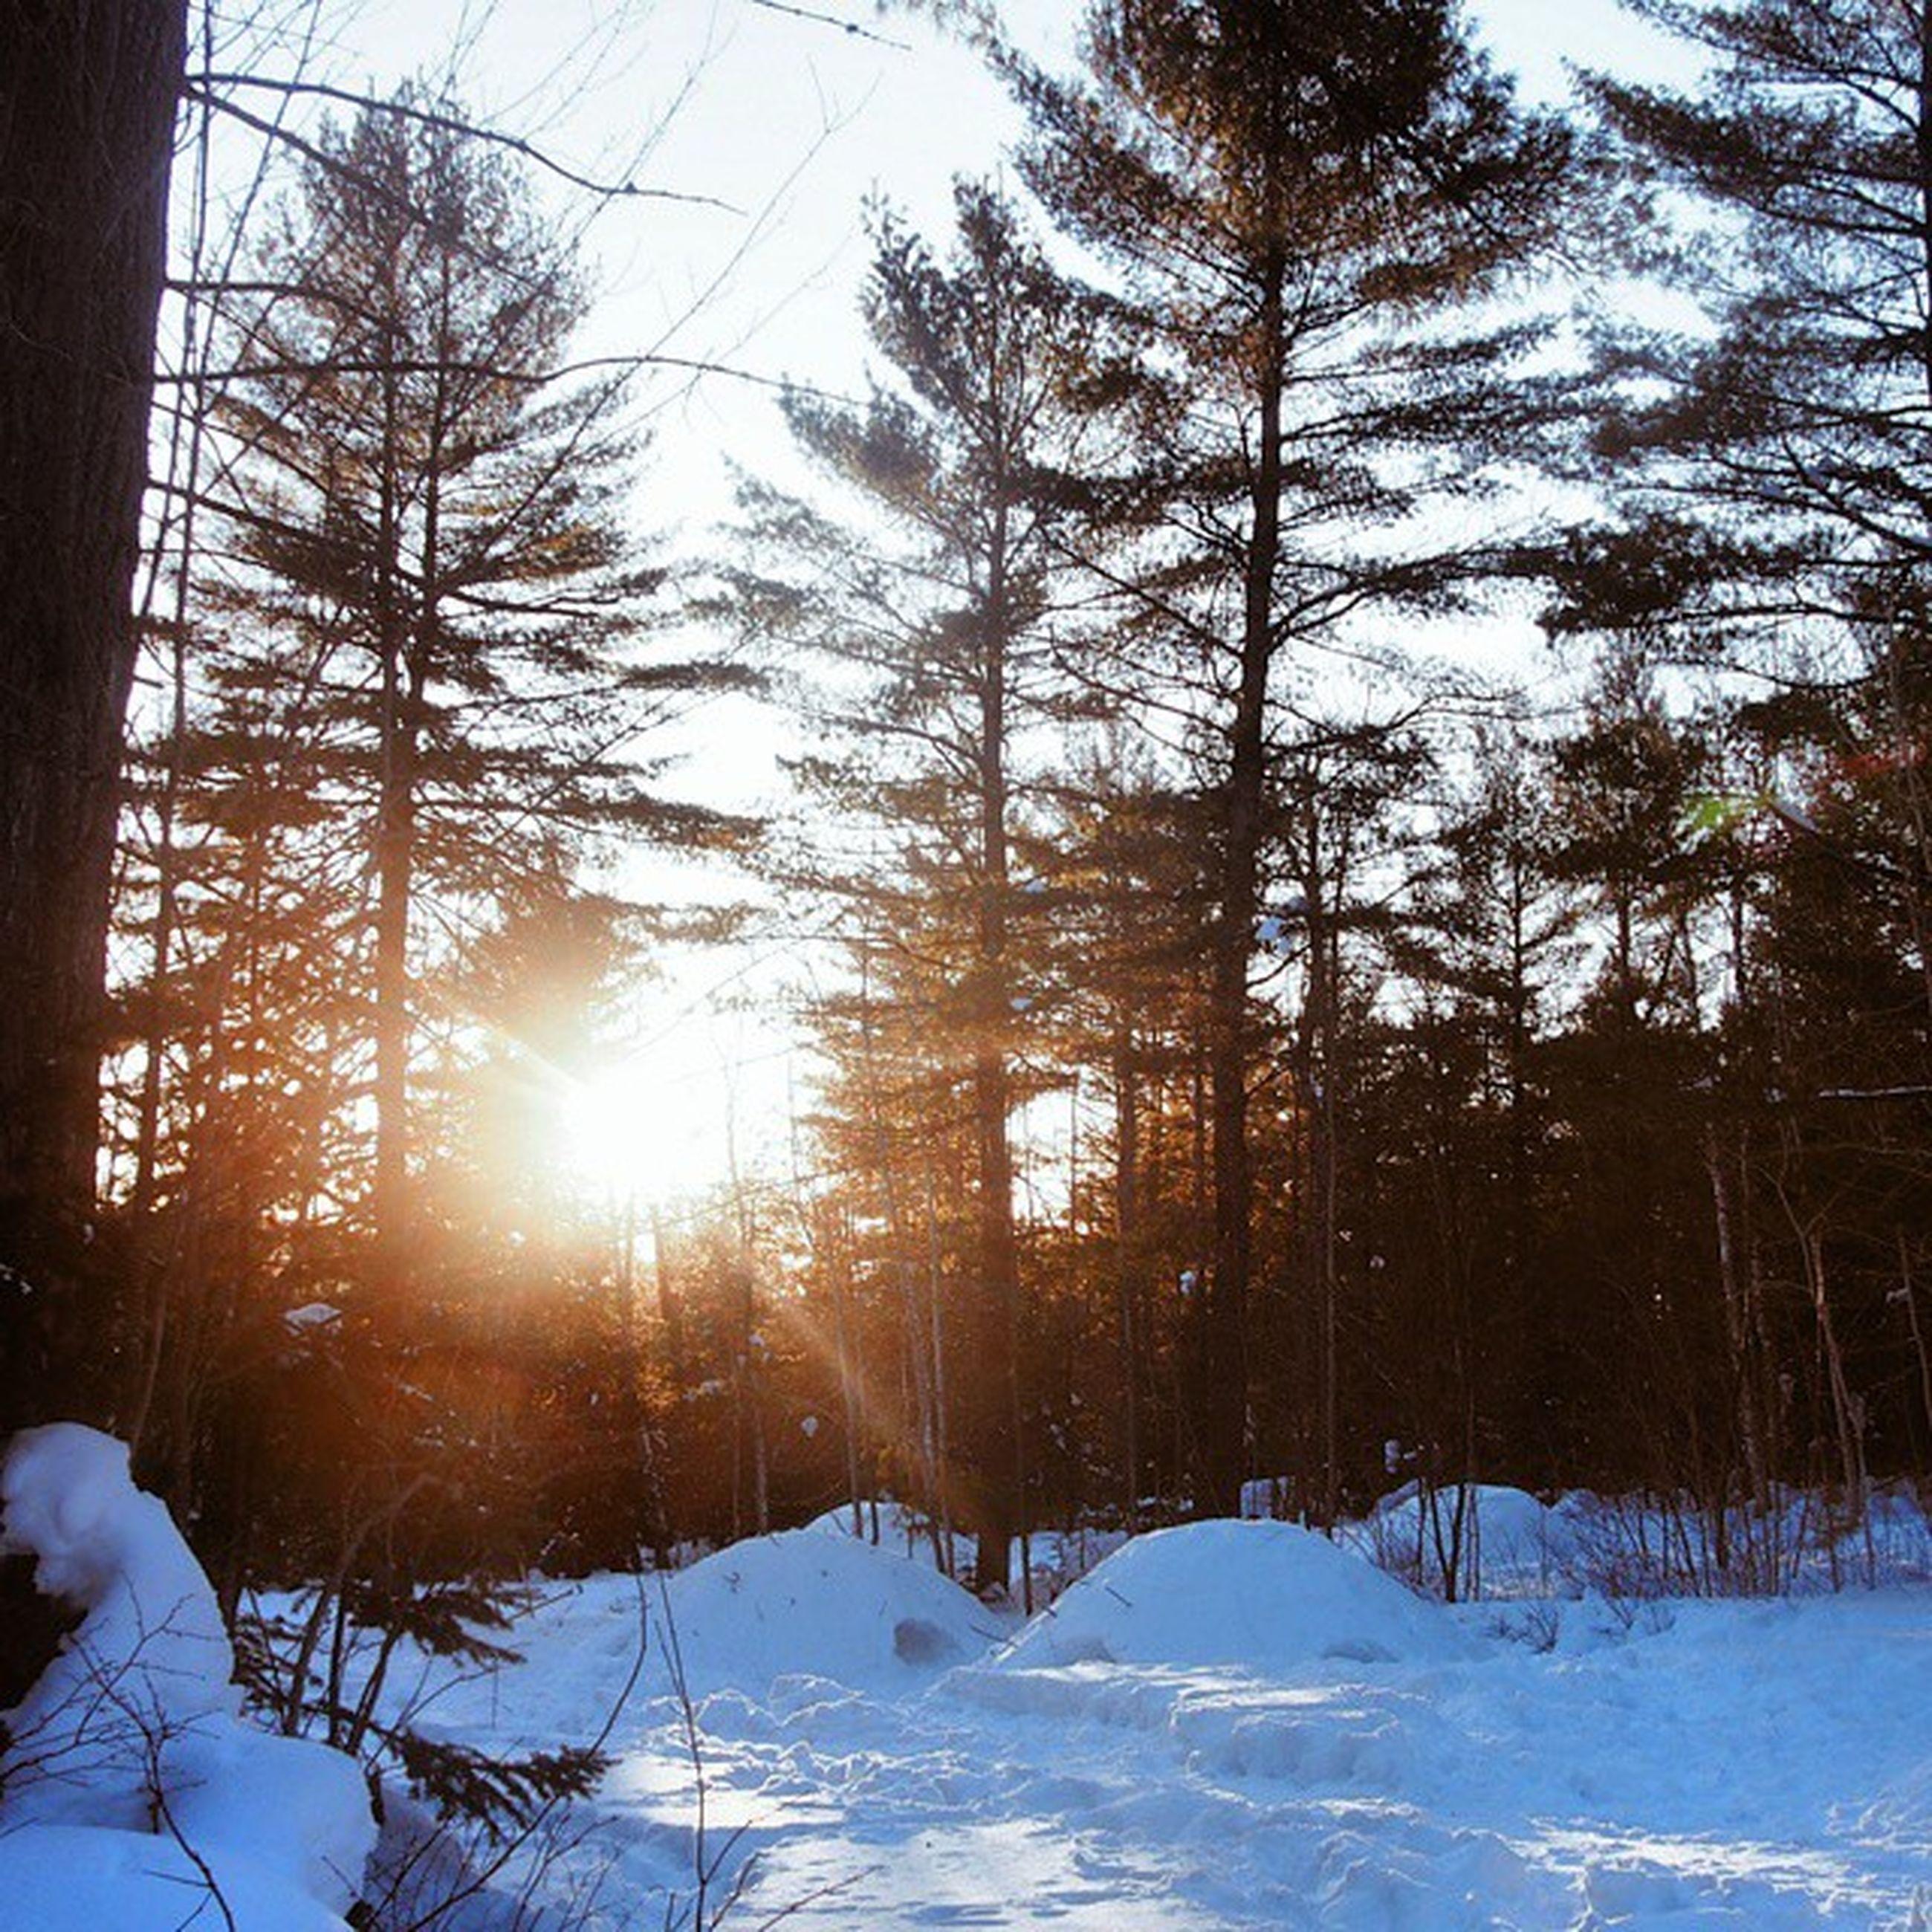 snow, winter, cold temperature, season, weather, sun, tree, covering, frozen, tranquility, nature, tranquil scene, beauty in nature, bare tree, landscape, sunlight, field, sunbeam, scenics, cold